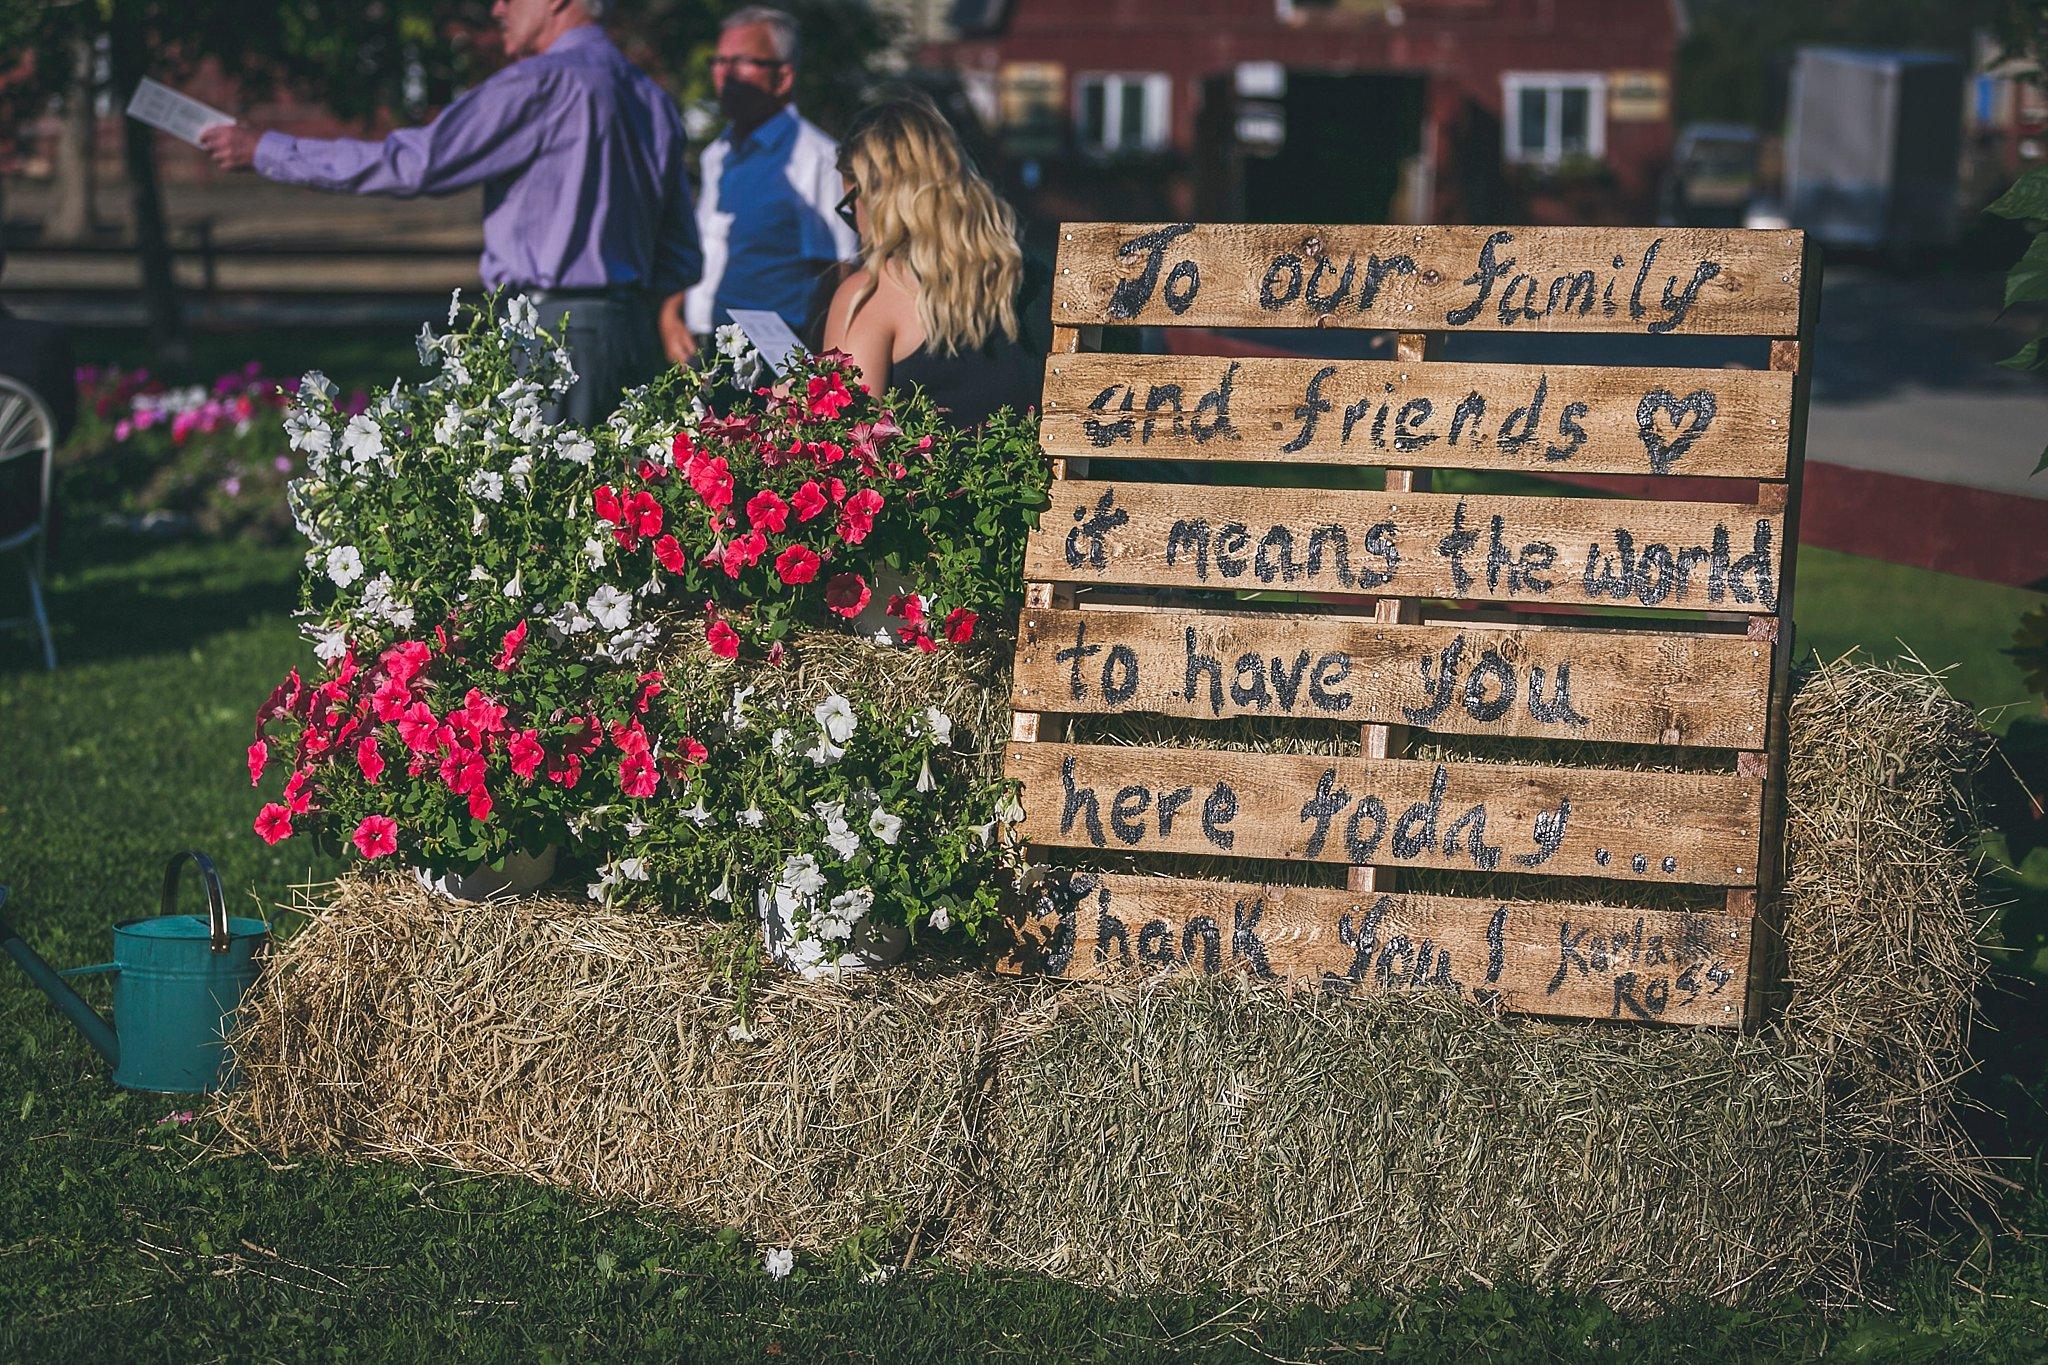 Wedding ceremony held at Lester's Farm in St. John's, Newfoundland